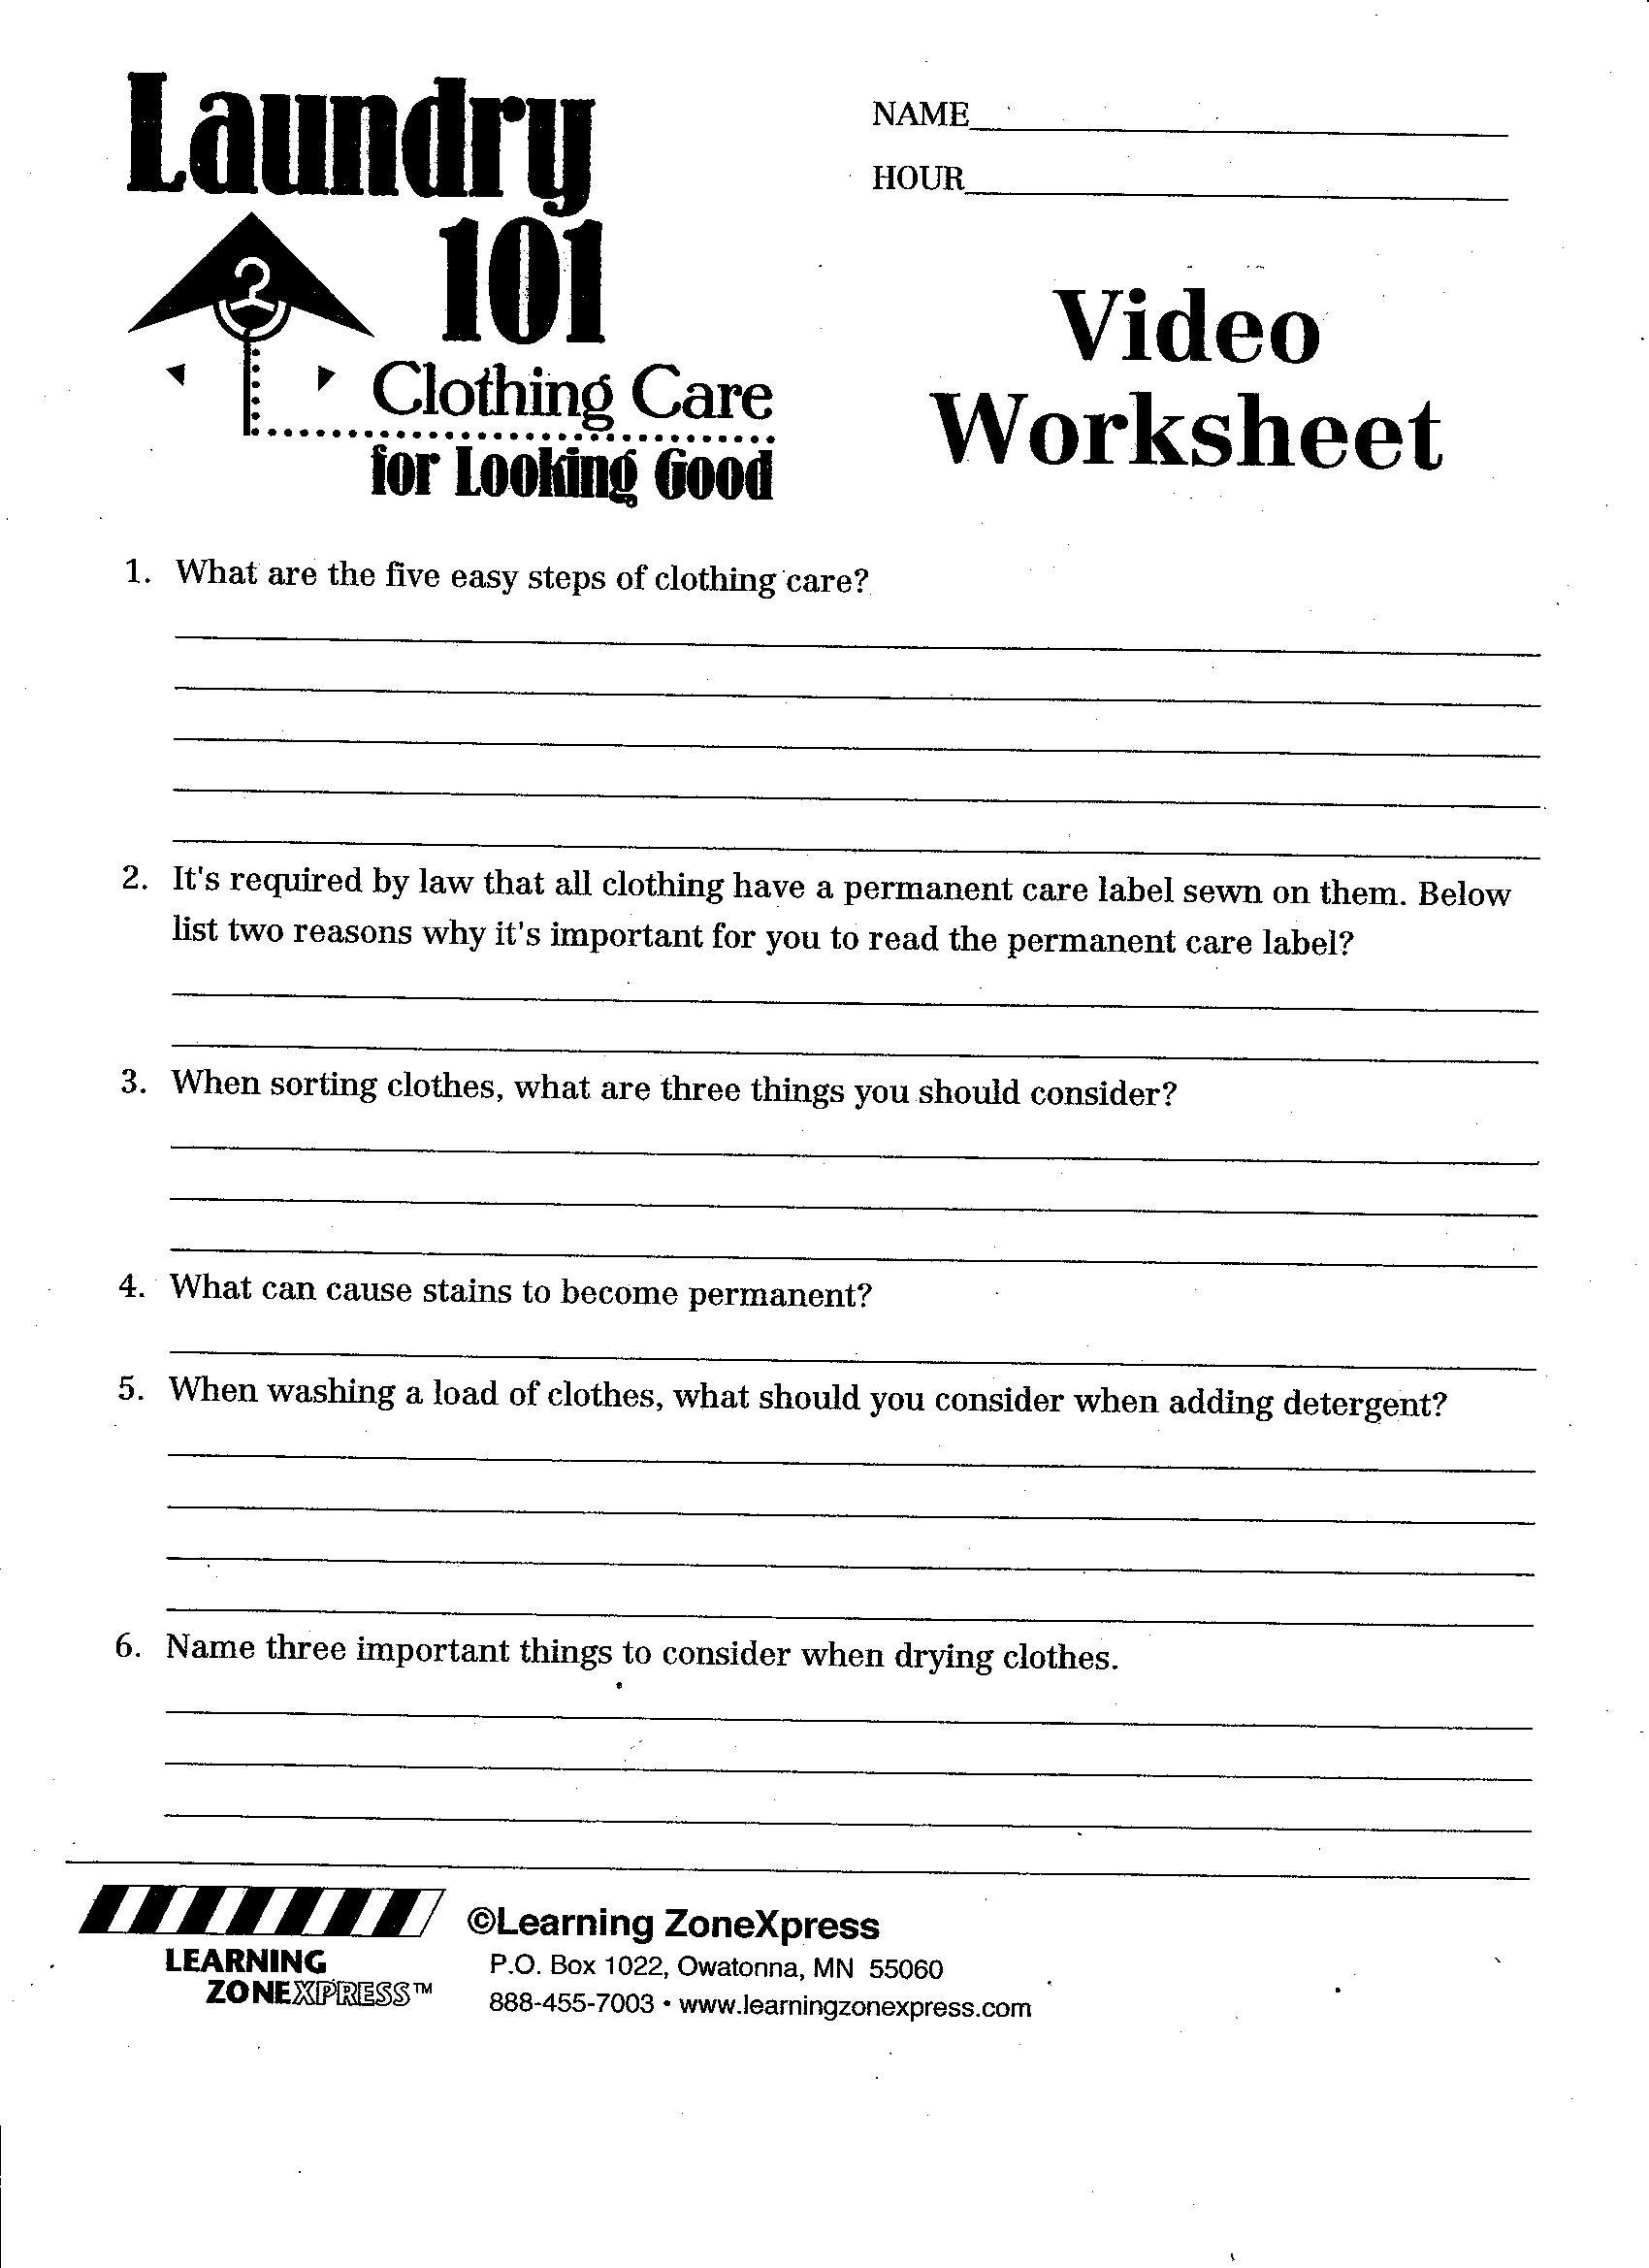 Sewing Ruler Measurements Worksheet